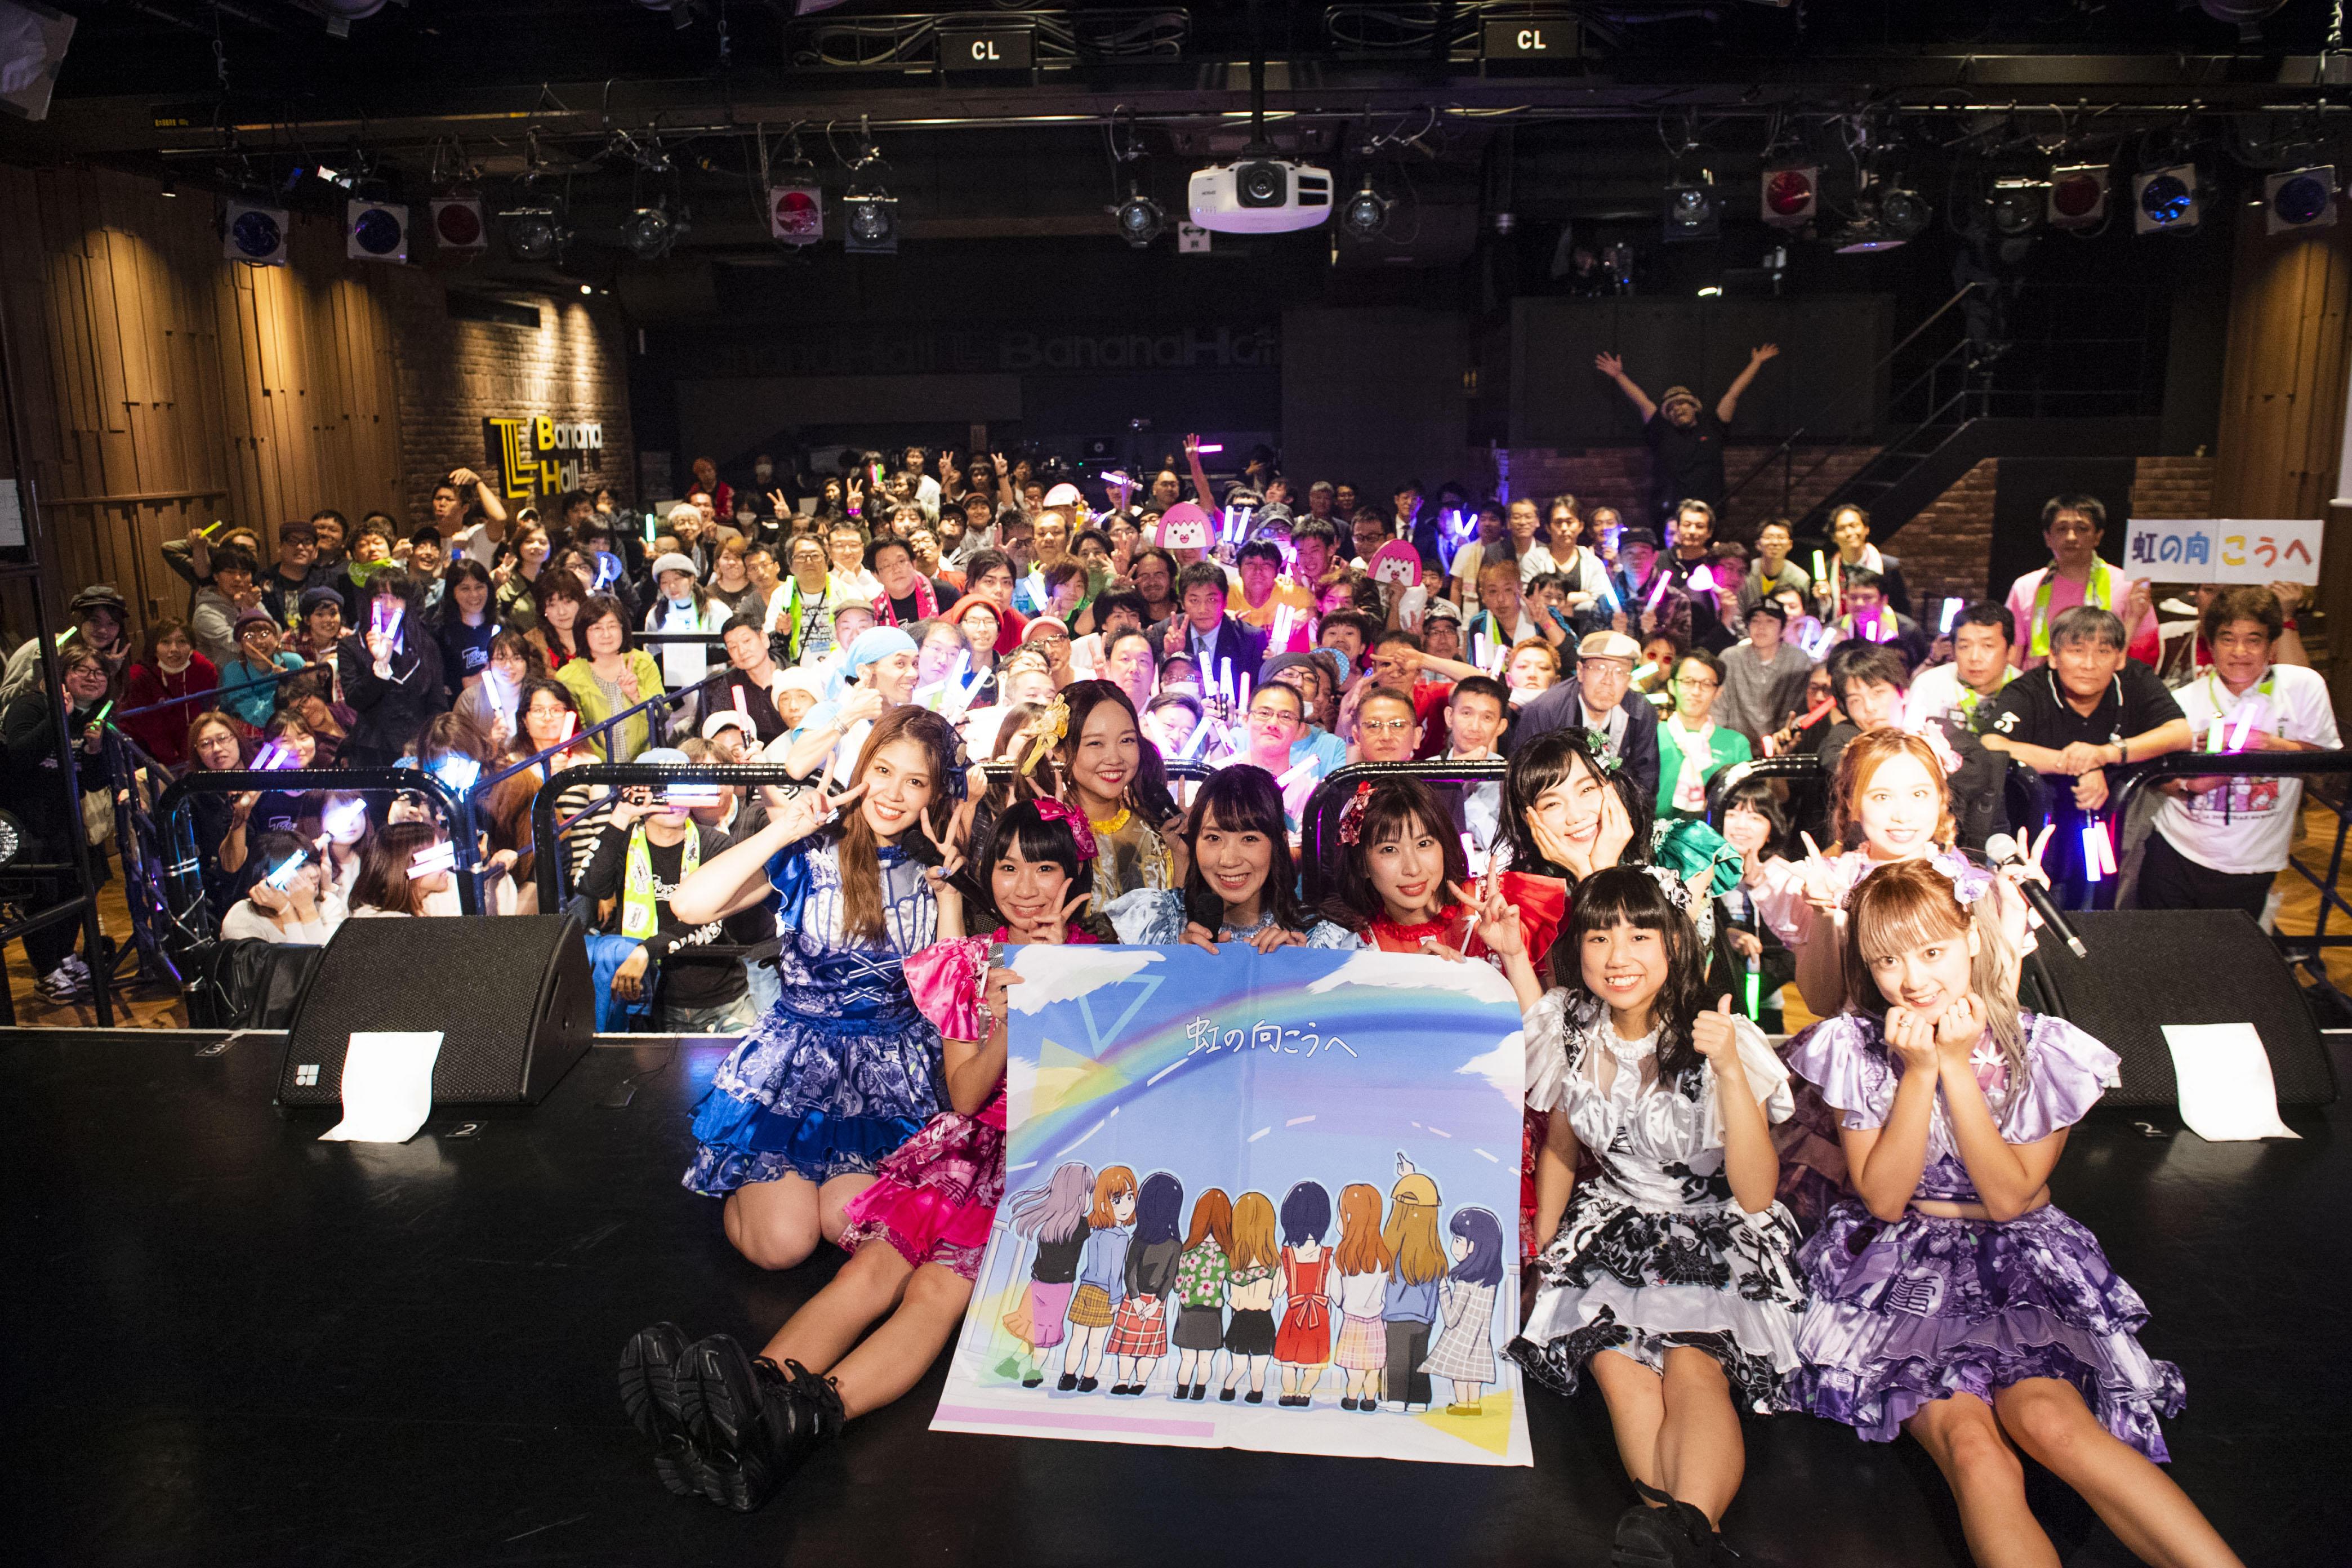 http://news.yoshimoto.co.jp/20181108183557-c734b5a176615f5c80199250025b12d69666dfdd.jpg